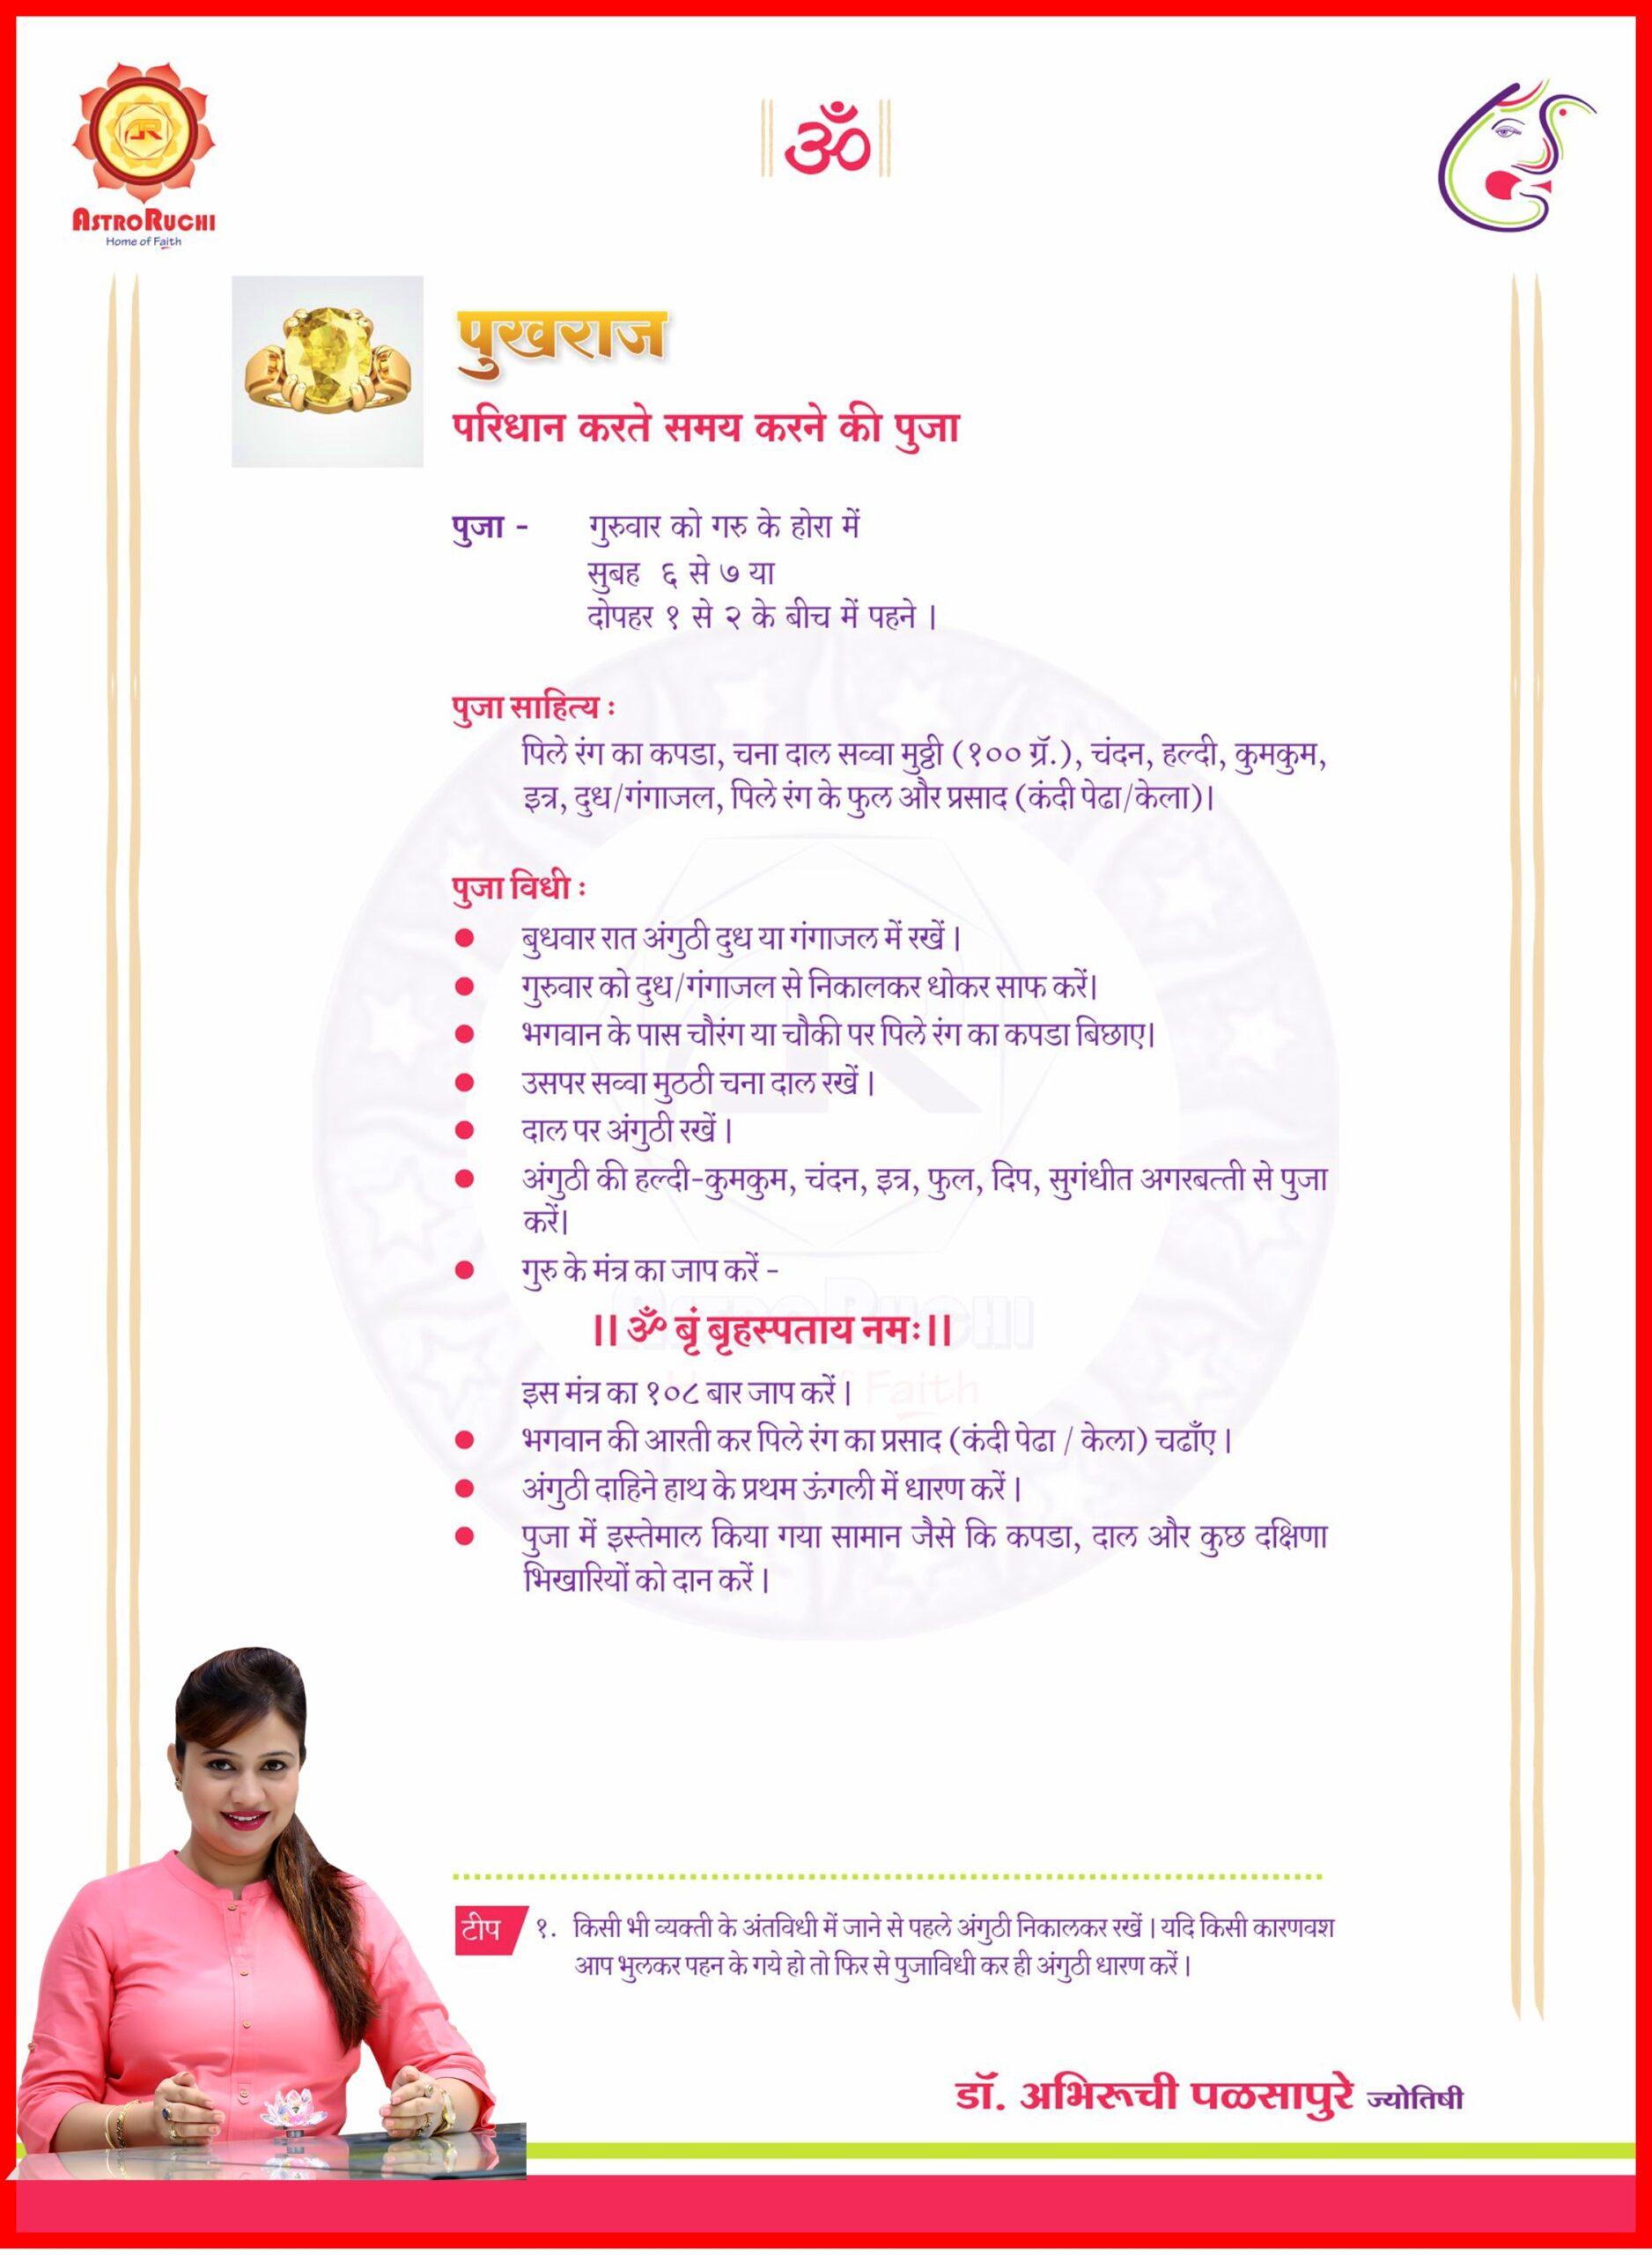 Astrology in India  Astroruchi is best astrologer in India